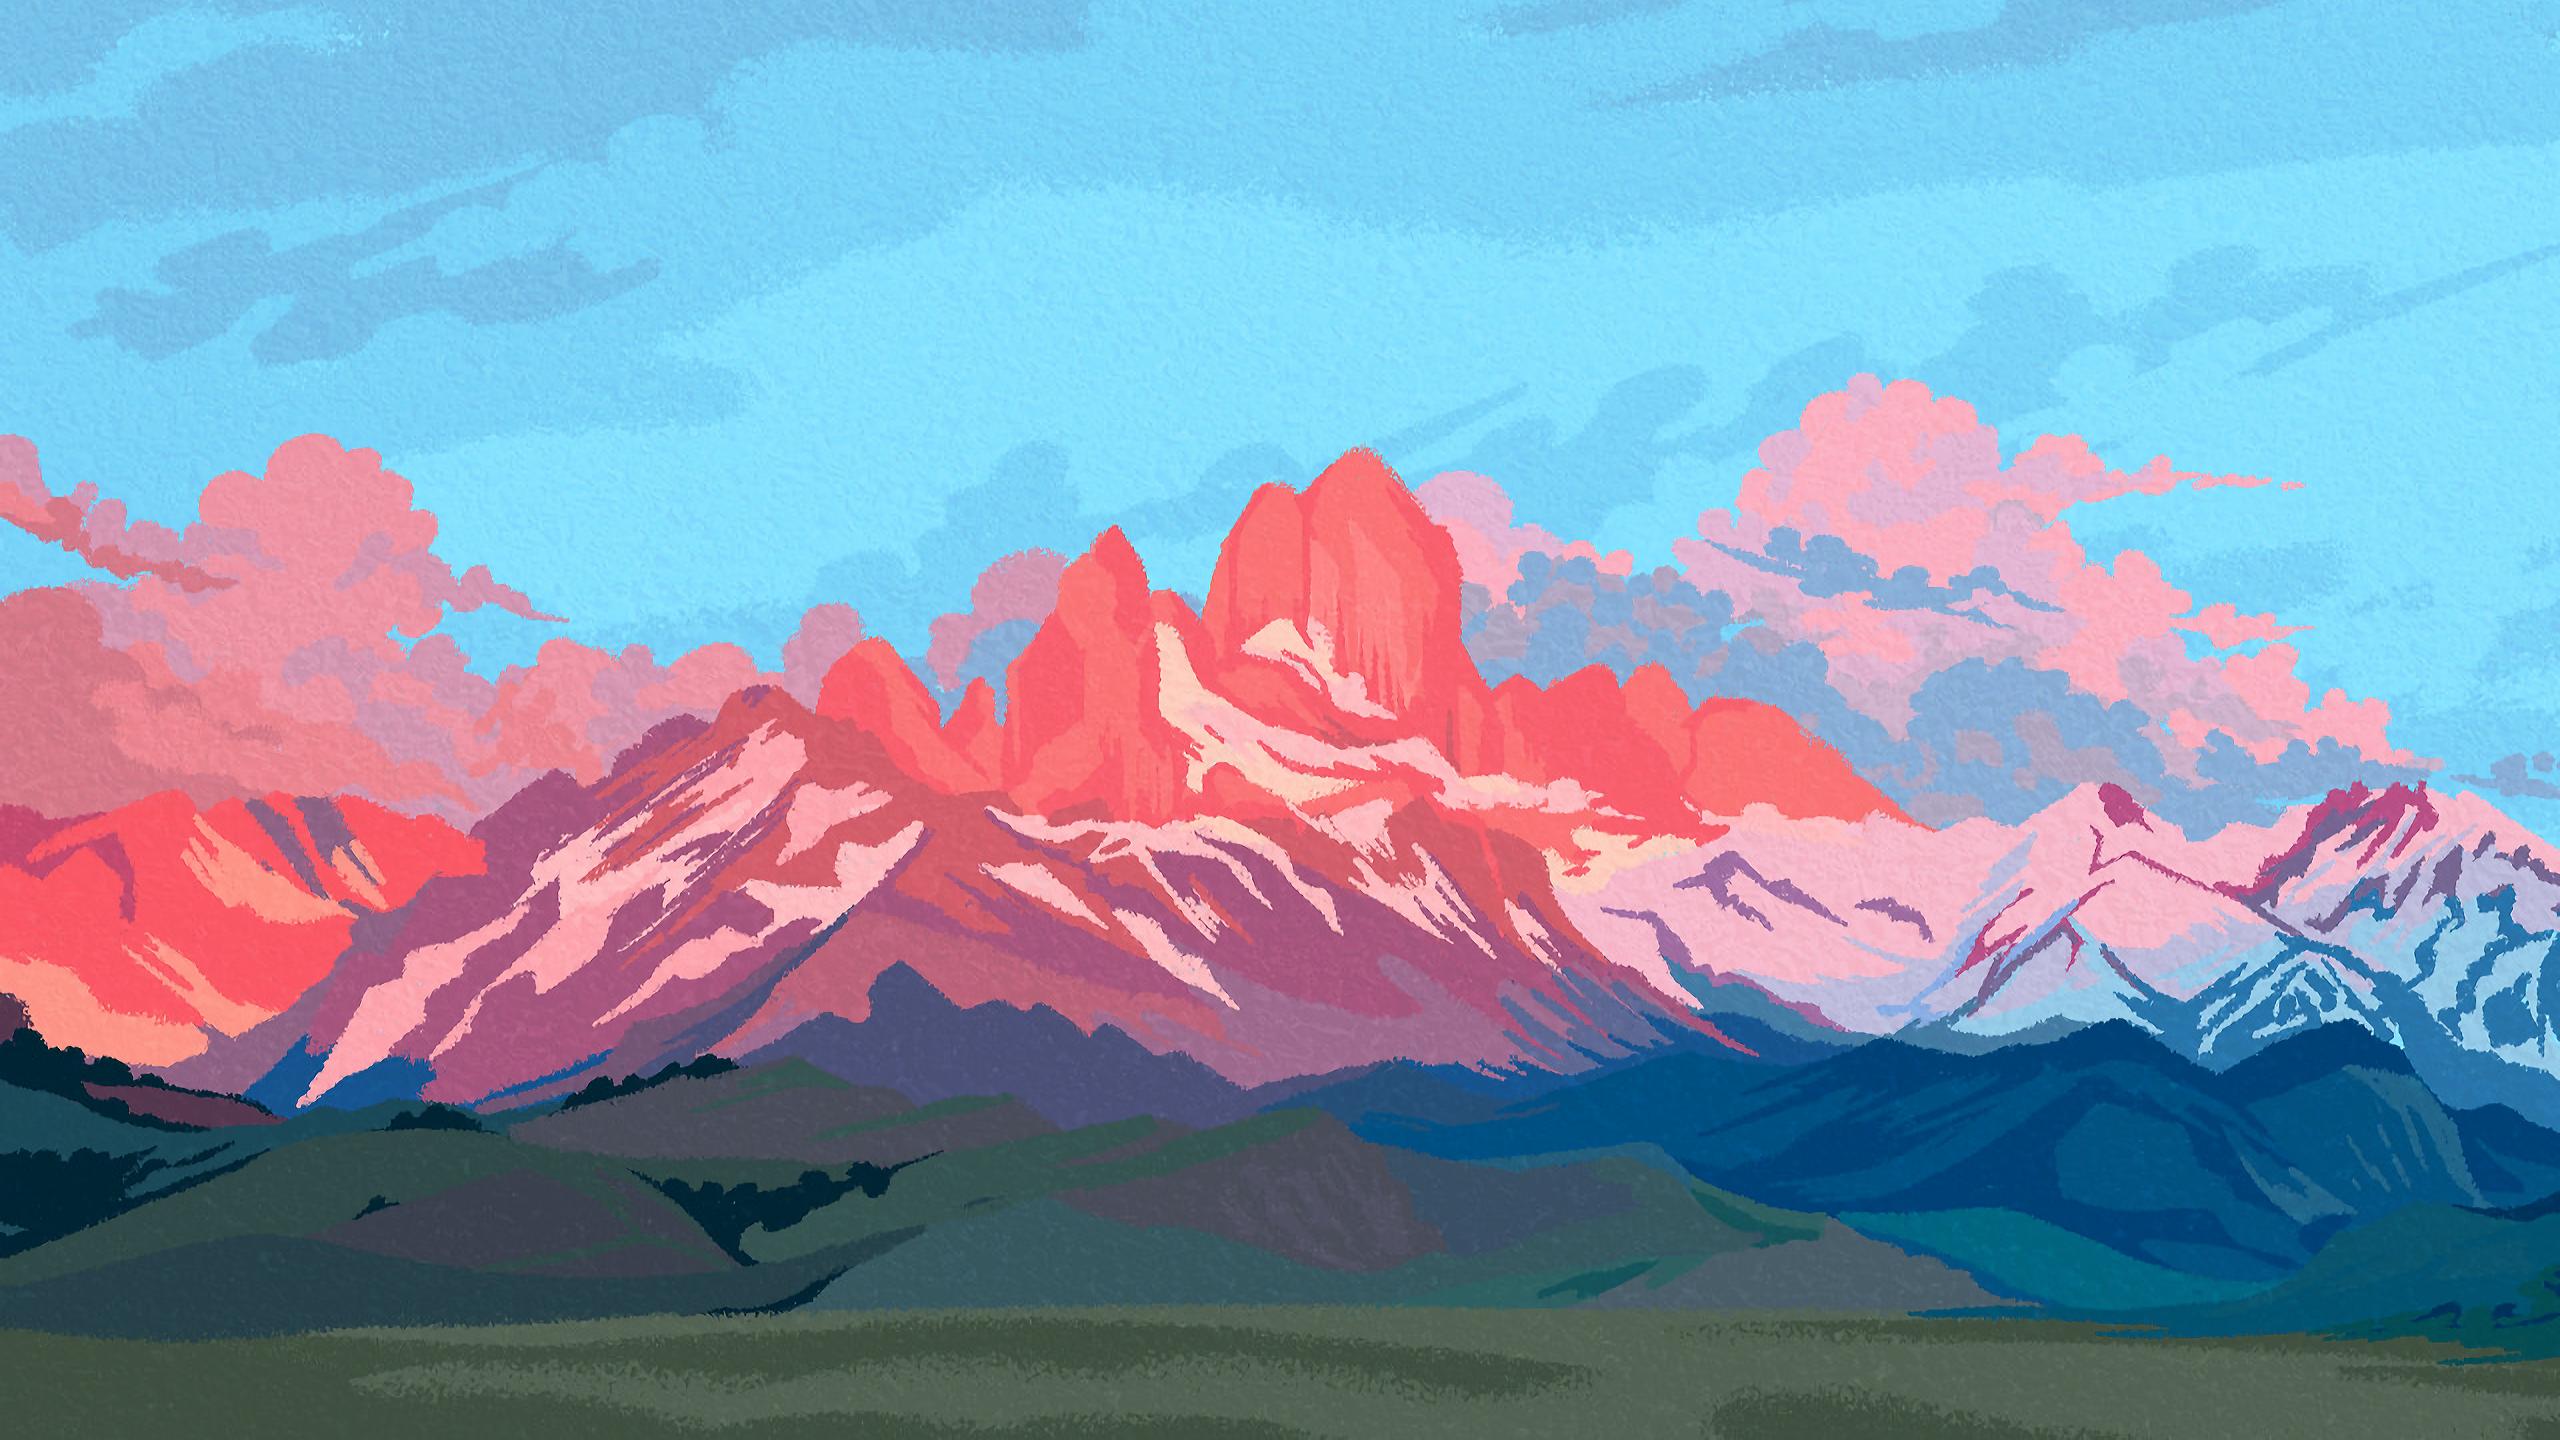 Pastal Practices 8pxl 2560x1440 Pixel Art Art Wallpaper